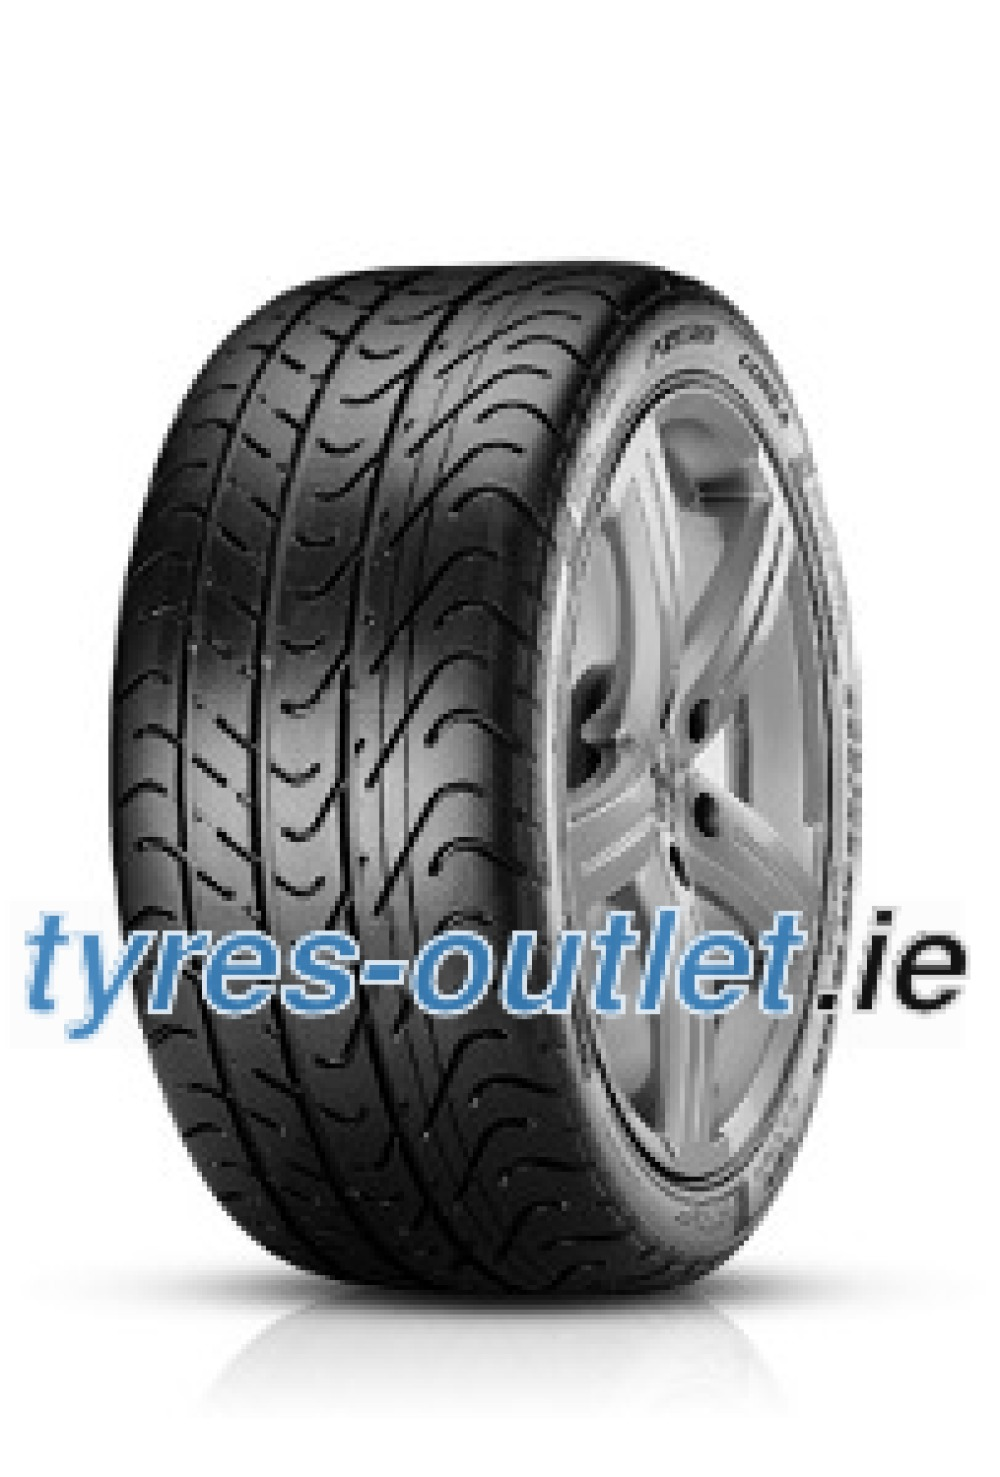 Pirelli P ZERO CORSA ( 225/35 ZR19 (88Y) XL MC, PNCS, with rim protection (MFS) )